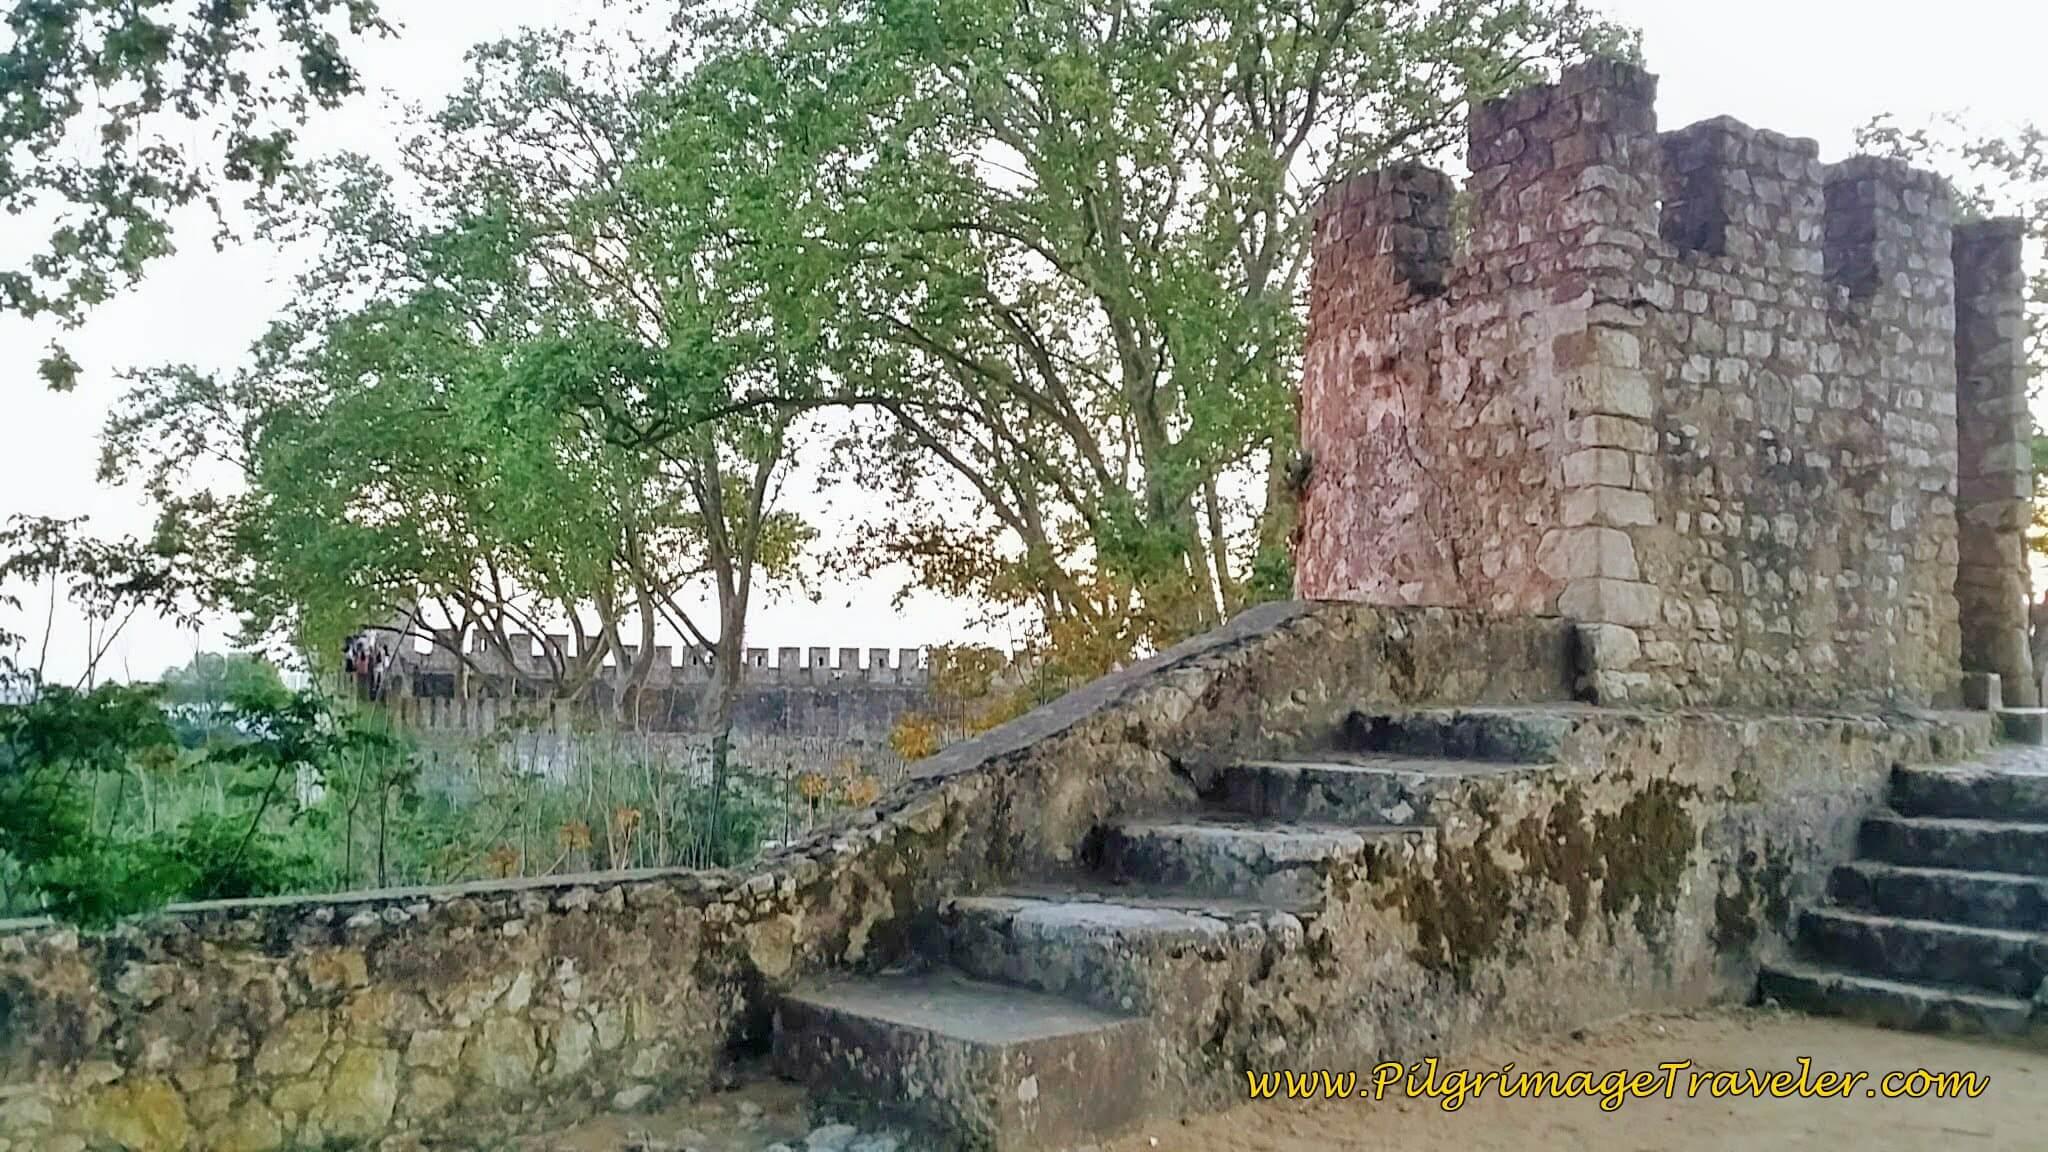 More Remnants of the Citadel in the Portas do Sol, Santarém, Portugal